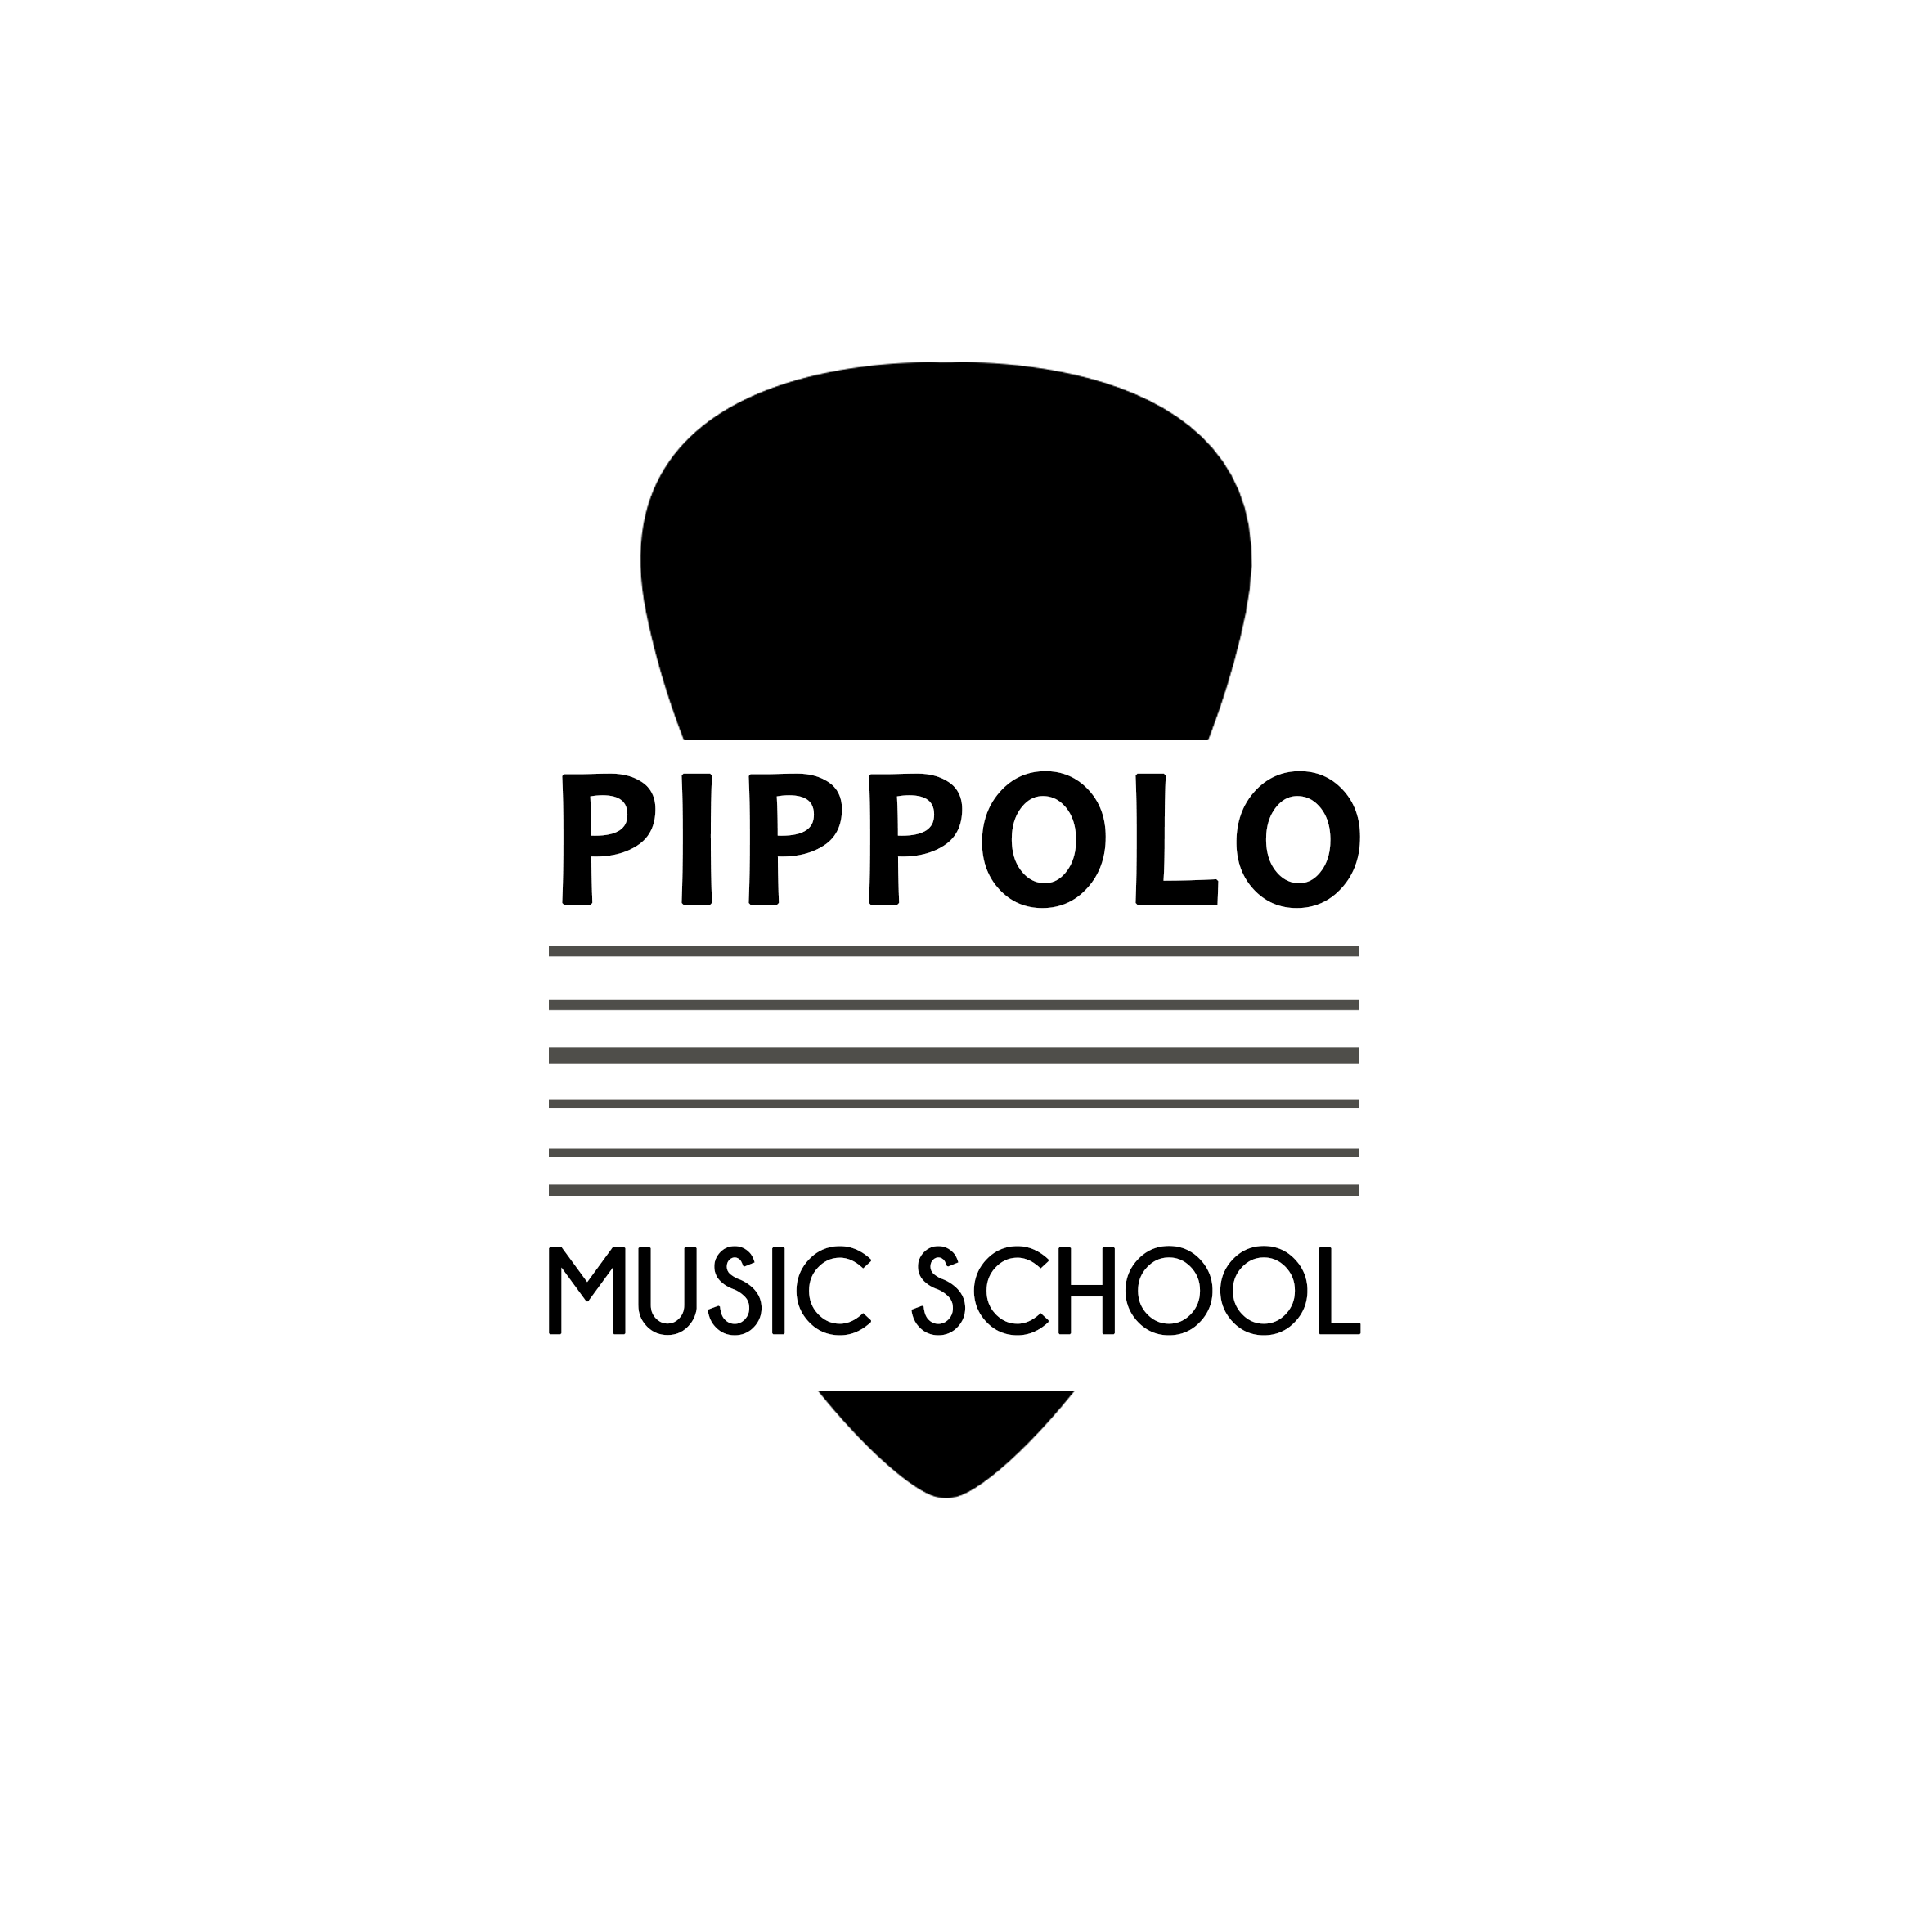 Pippolo - Music School